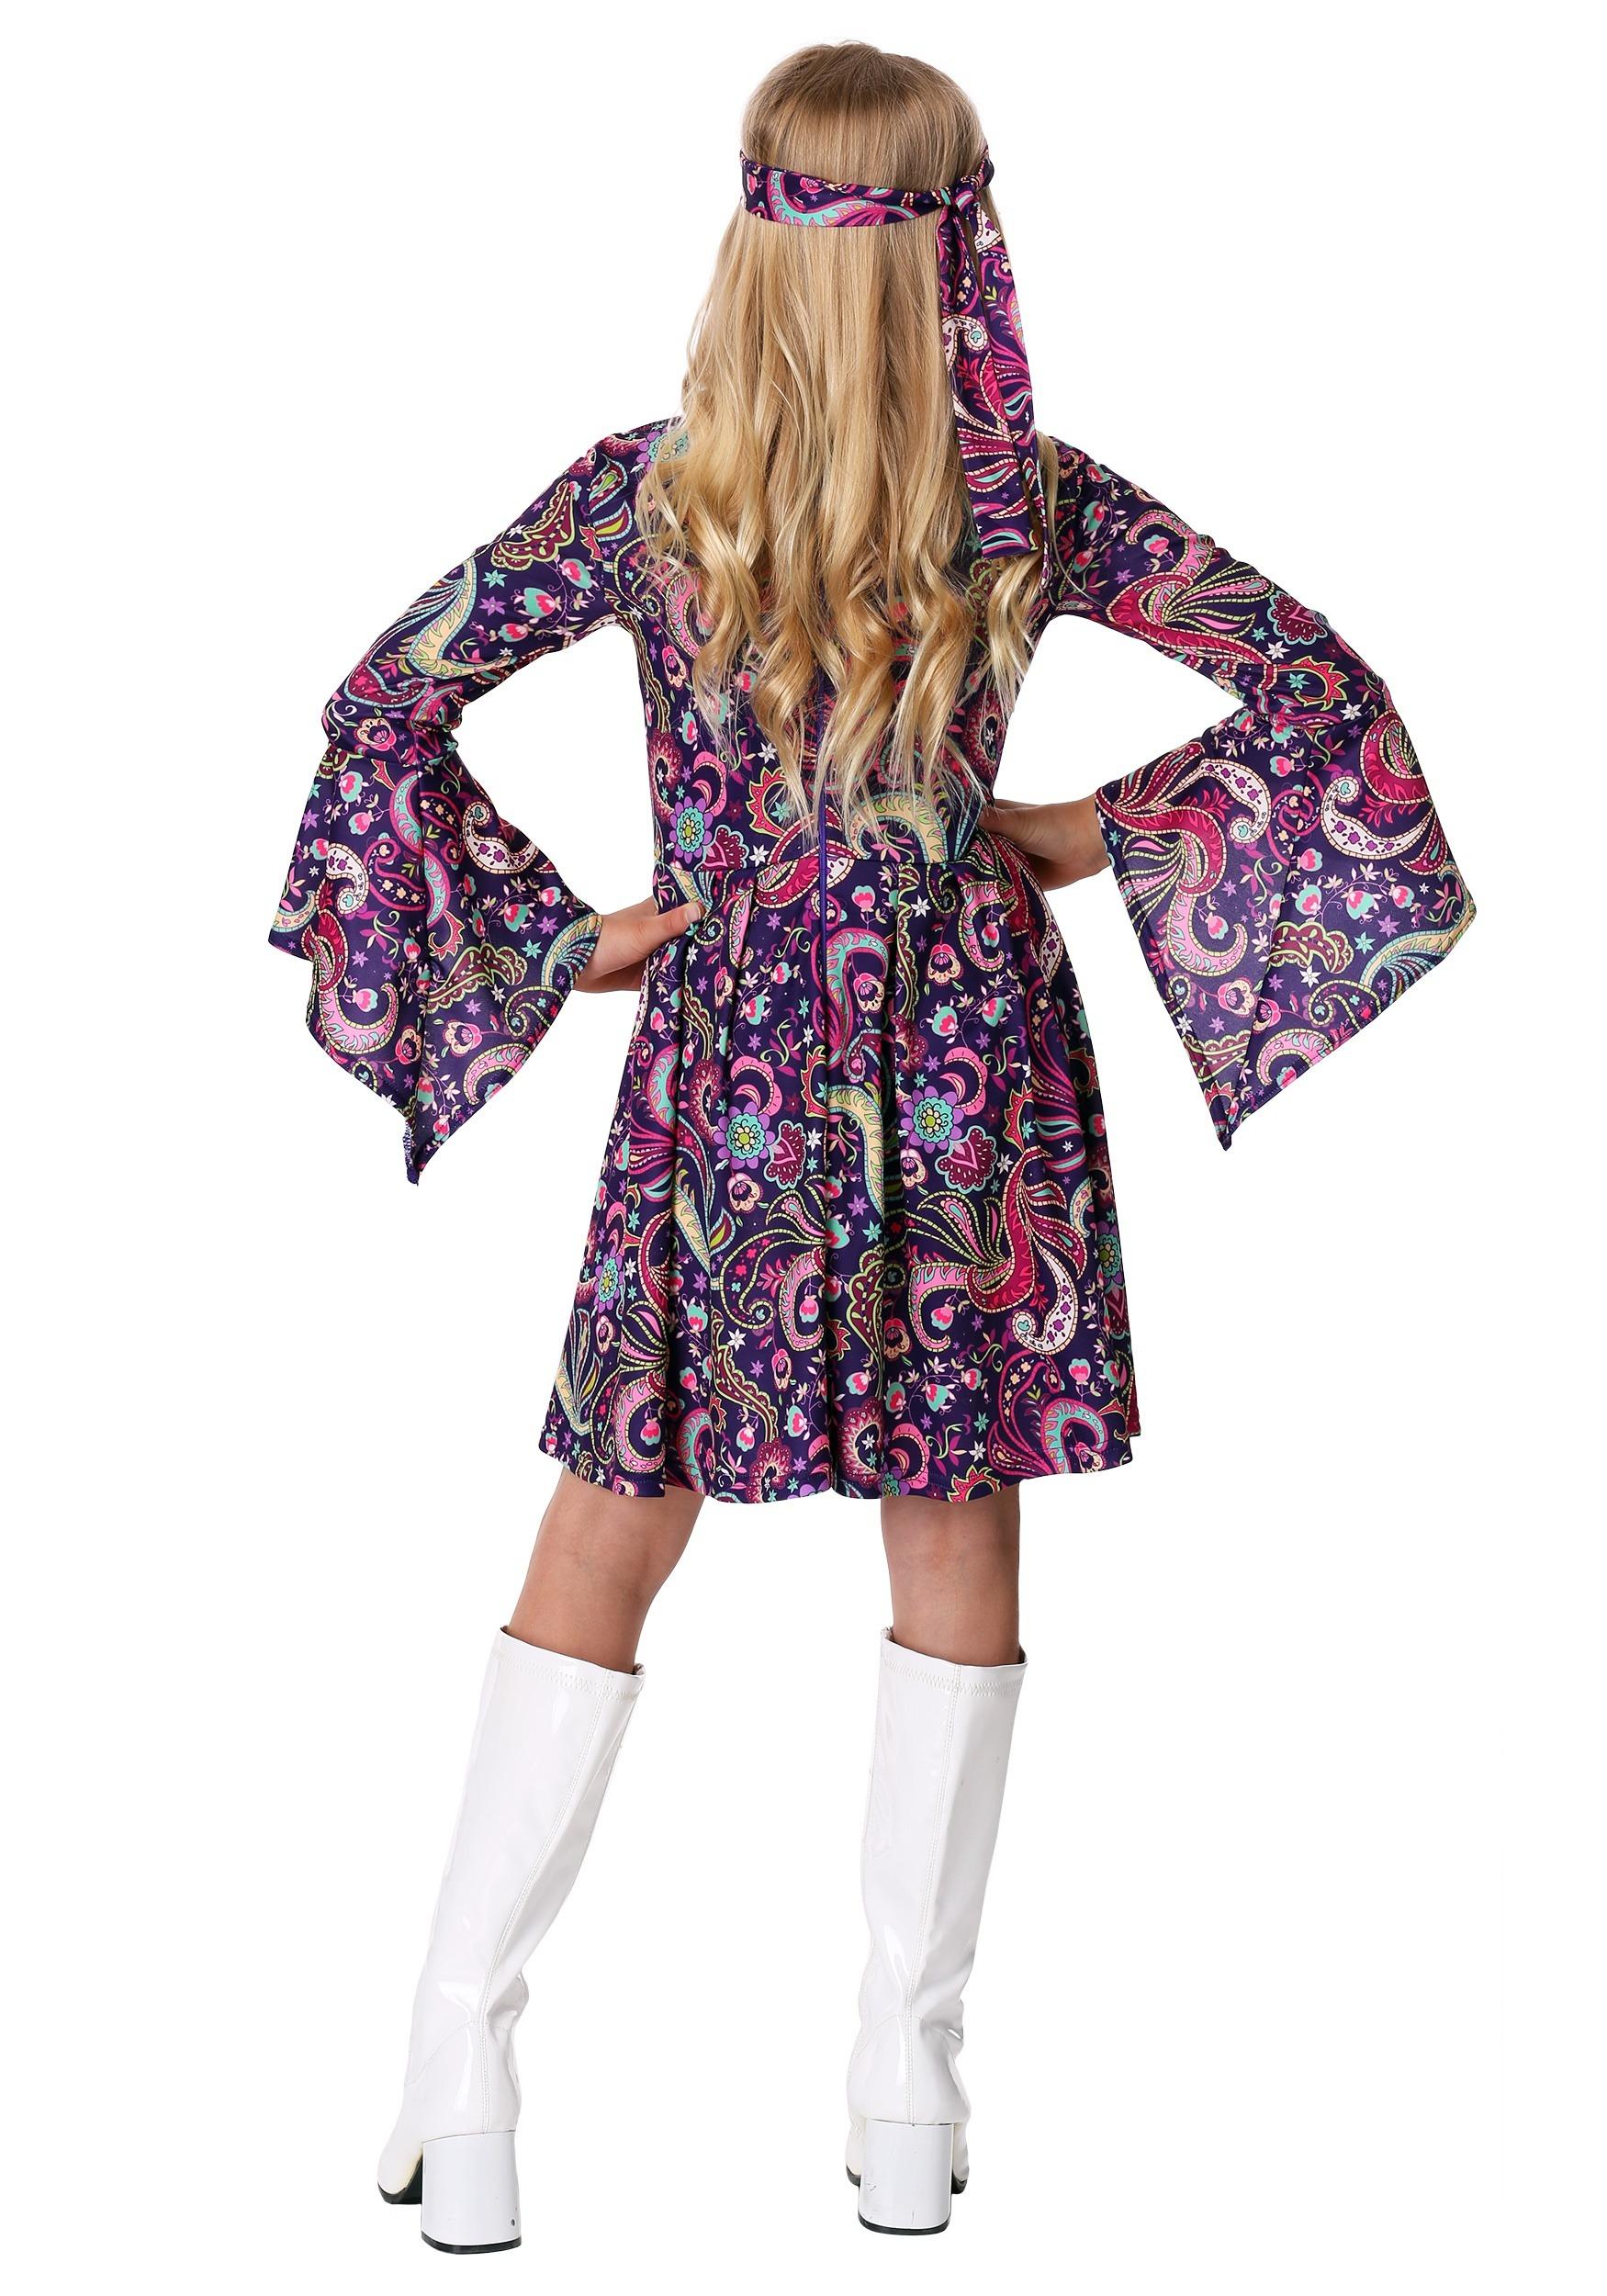 c174385bfa1f Girl's Woodstock Hippie Costume